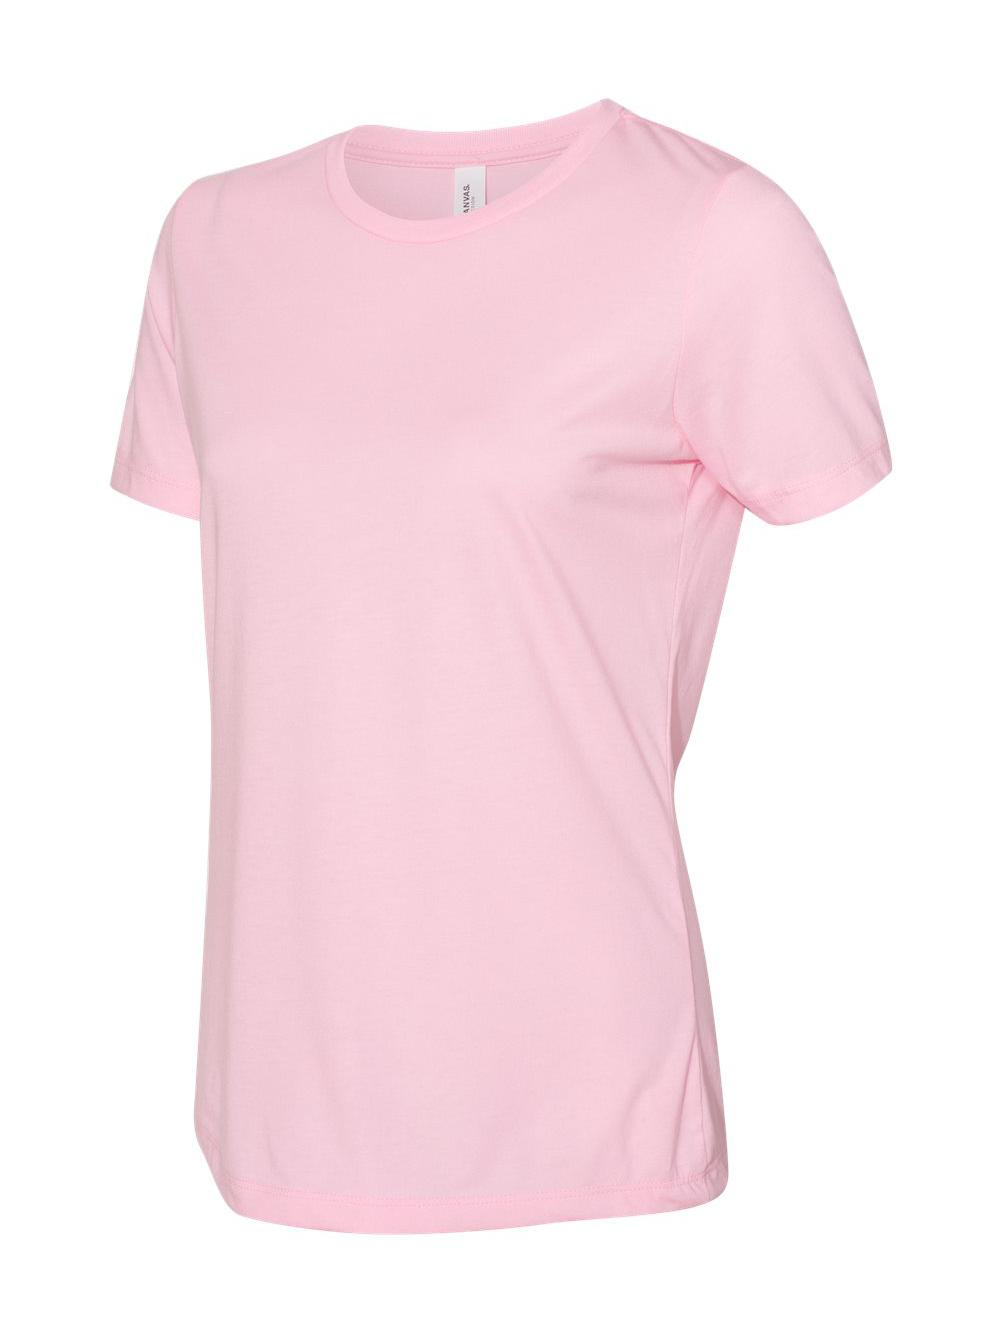 Bella-Canvas-Women-039-s-Relaxed-Short-Sleeve-Jersey-Tee-6400 thumbnail 62